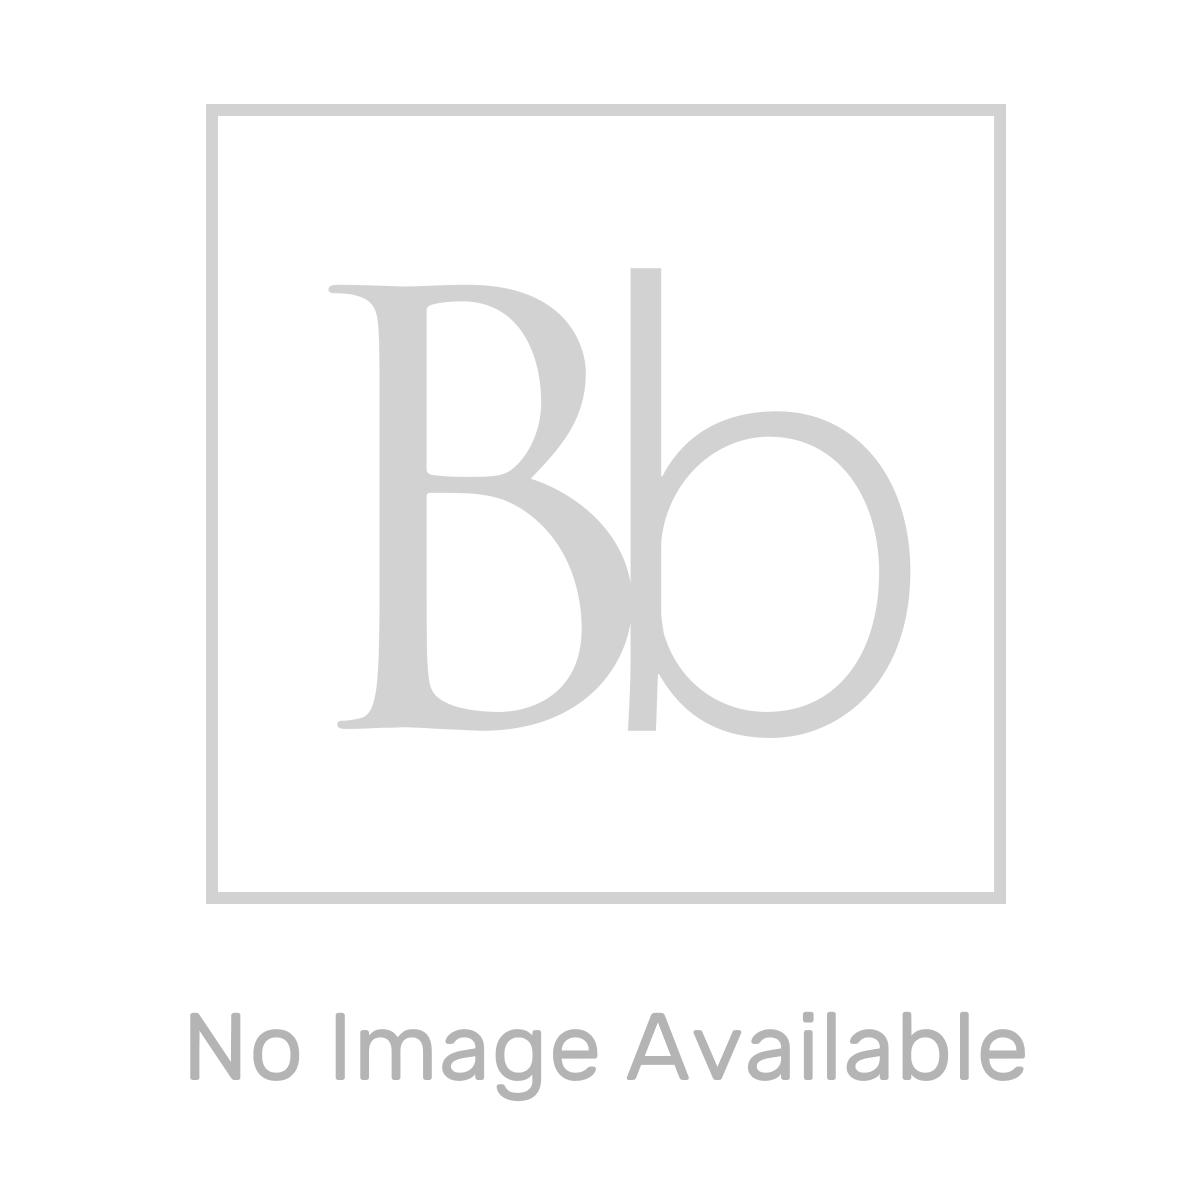 Stuart Turner 46500 Showermate Eco Standard Twin 2.0 Bar Pump Back